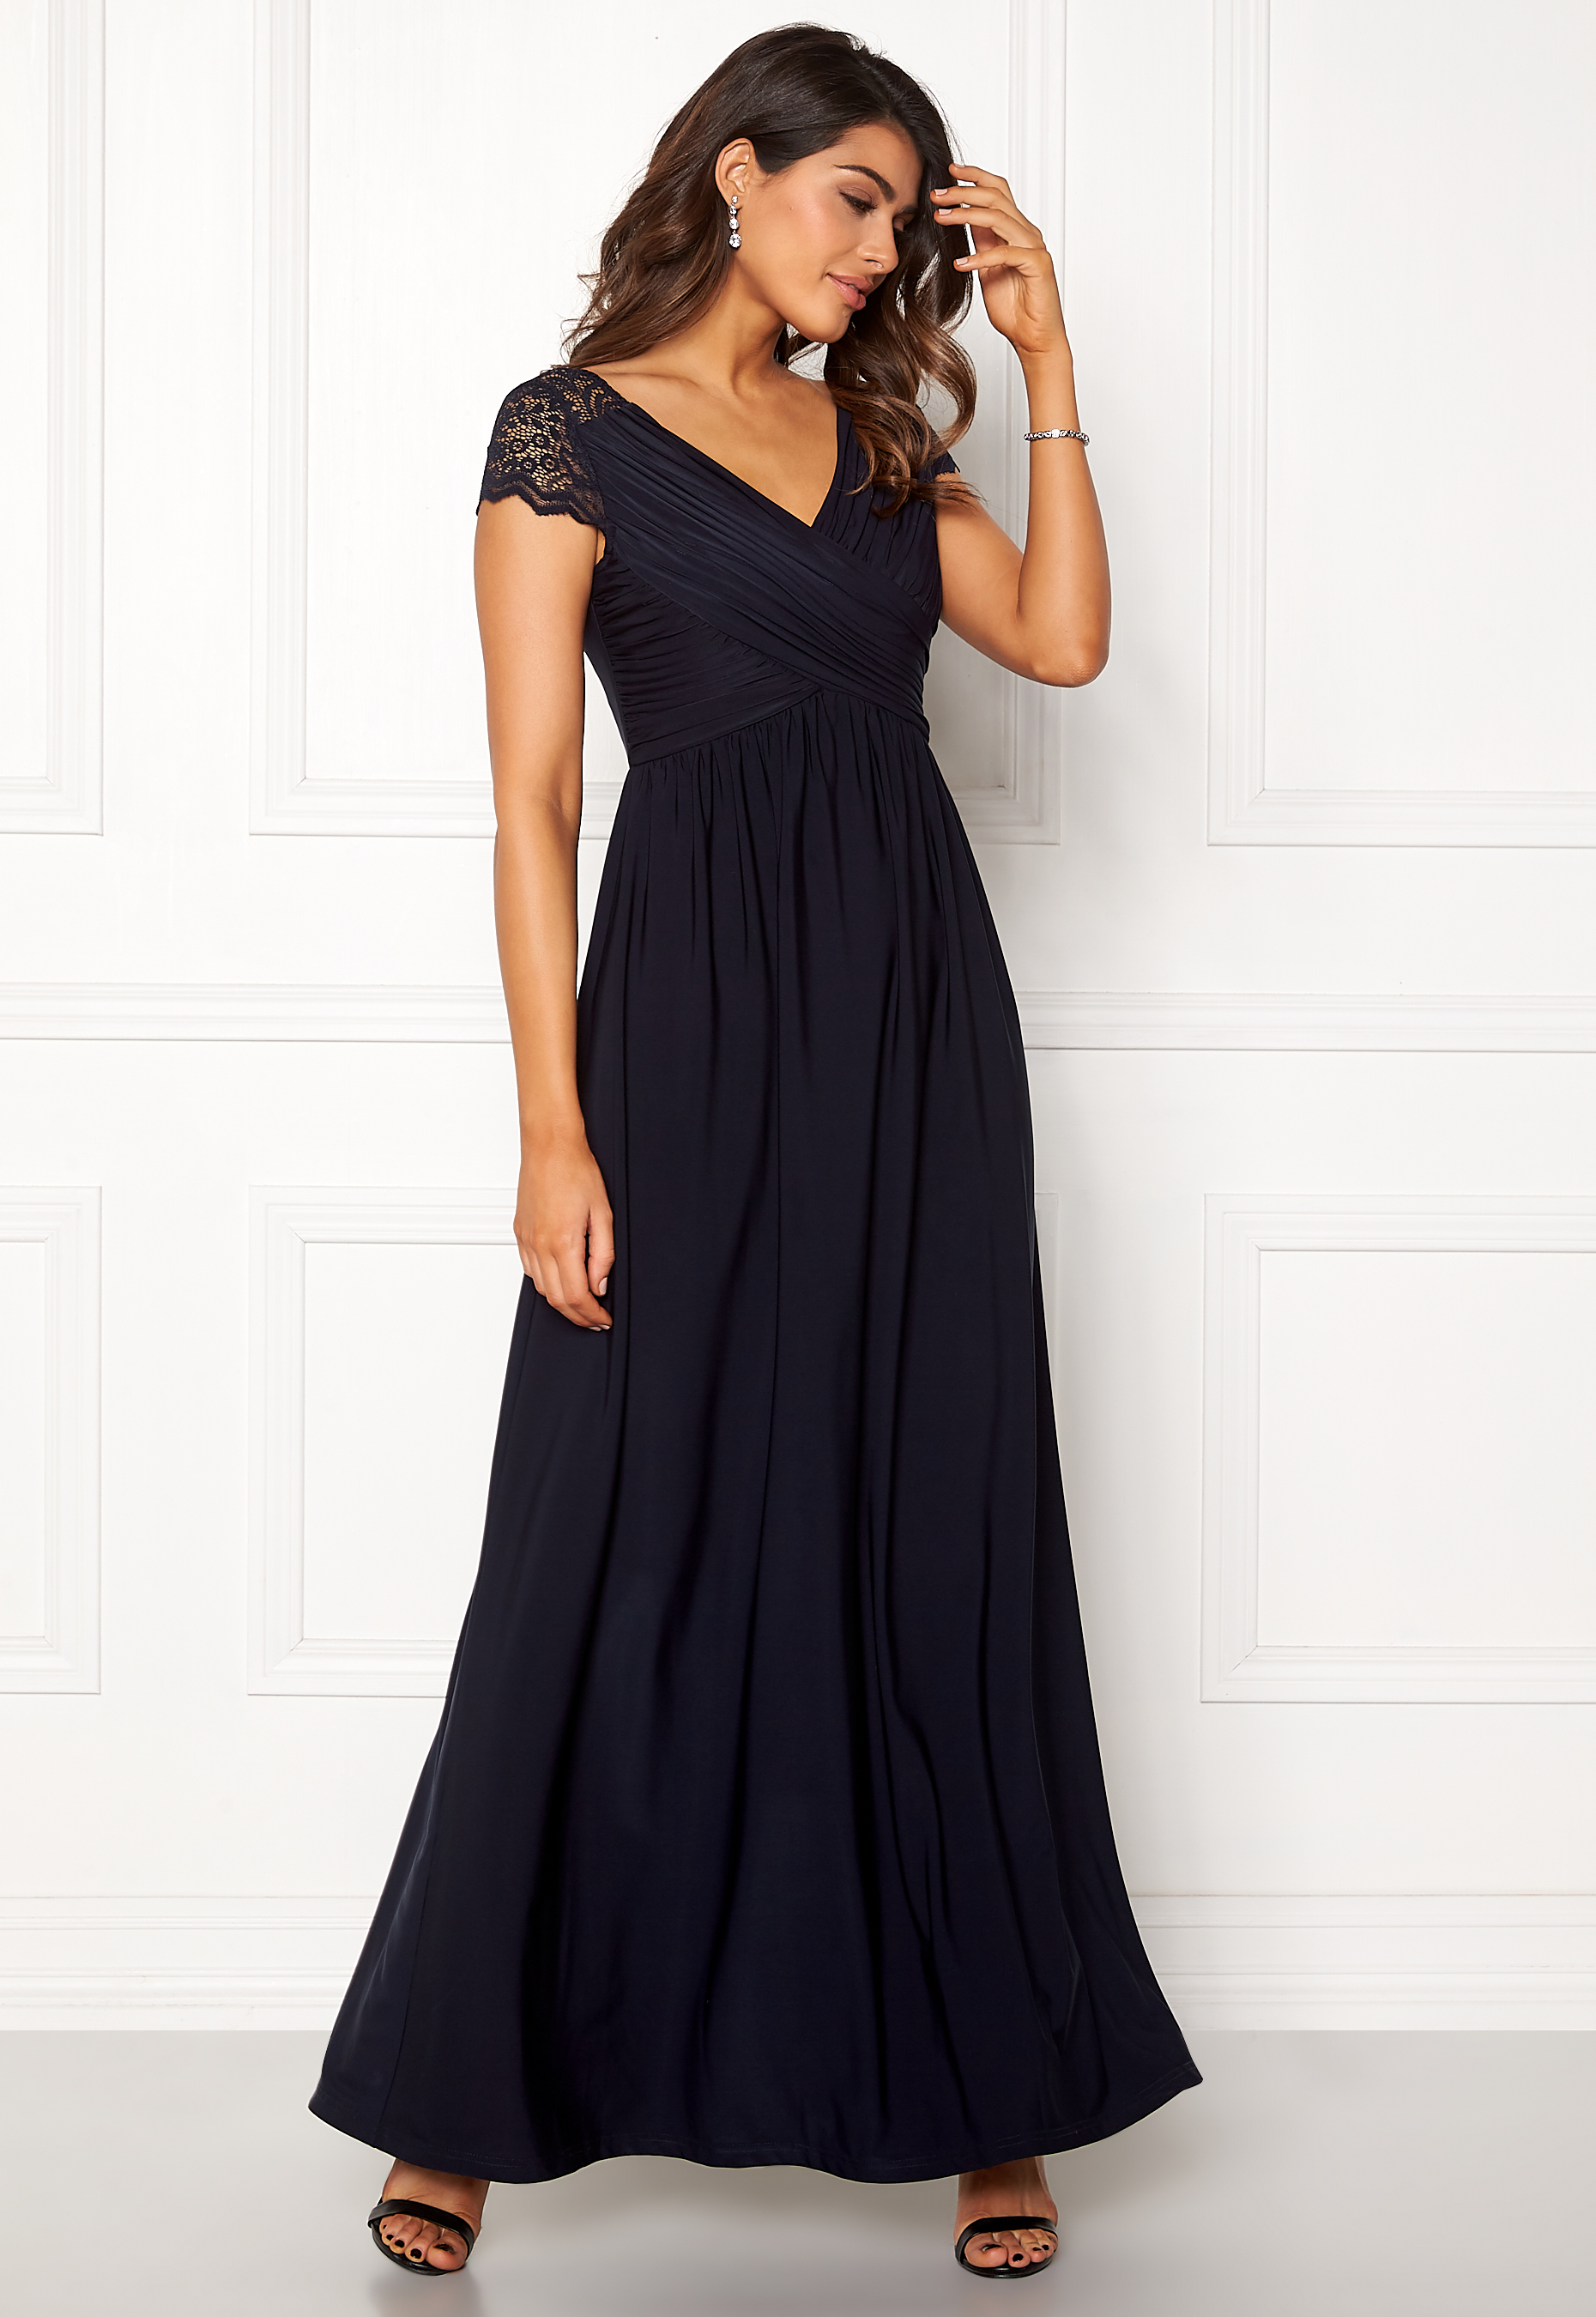 827e5e4e7b39 Chiara Forthi Aurelia dress Dark blue - Bubbleroom